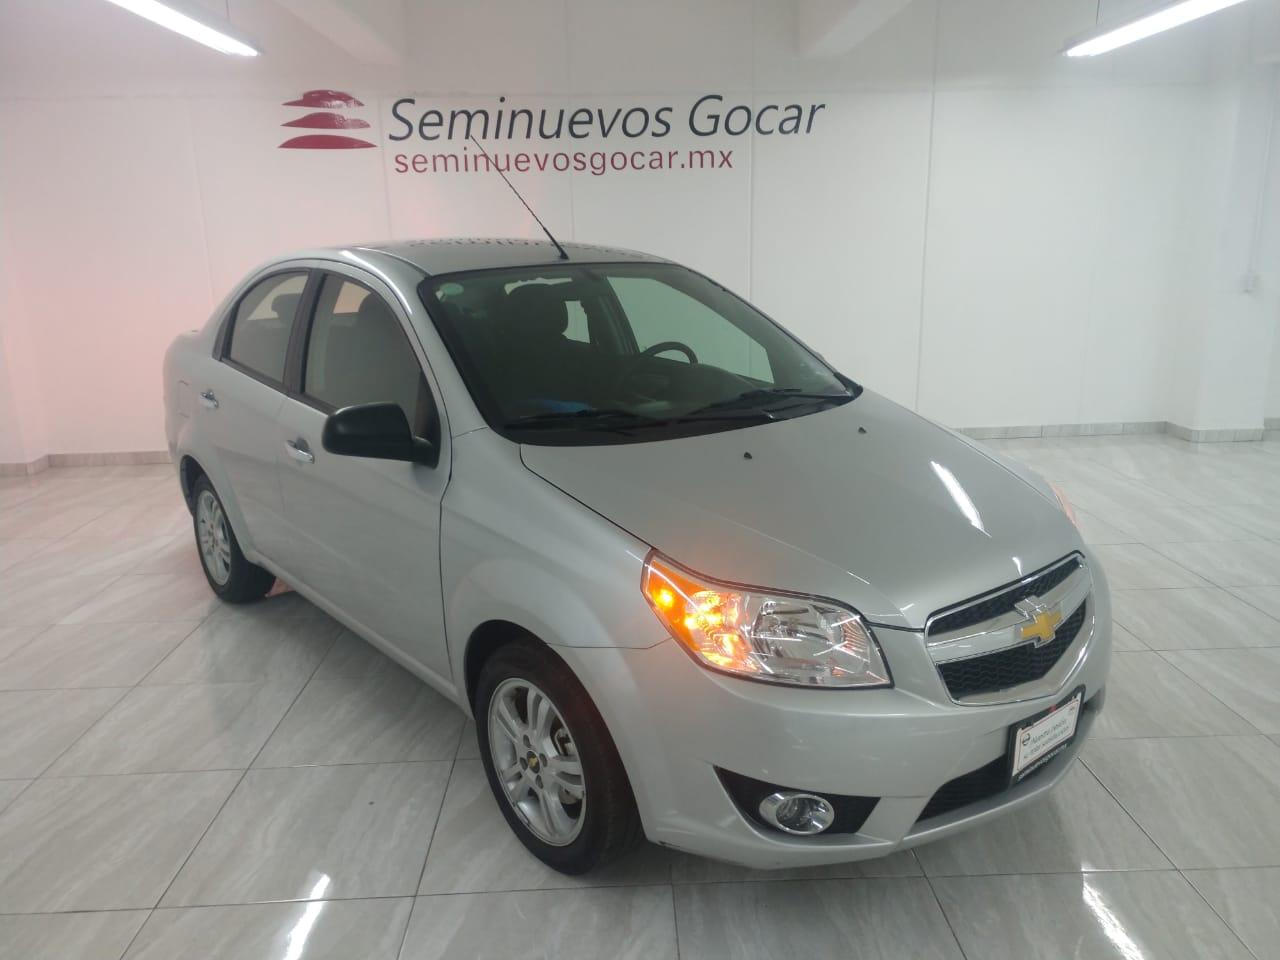 Chevrolet Aveo LTZ - GocarCredit